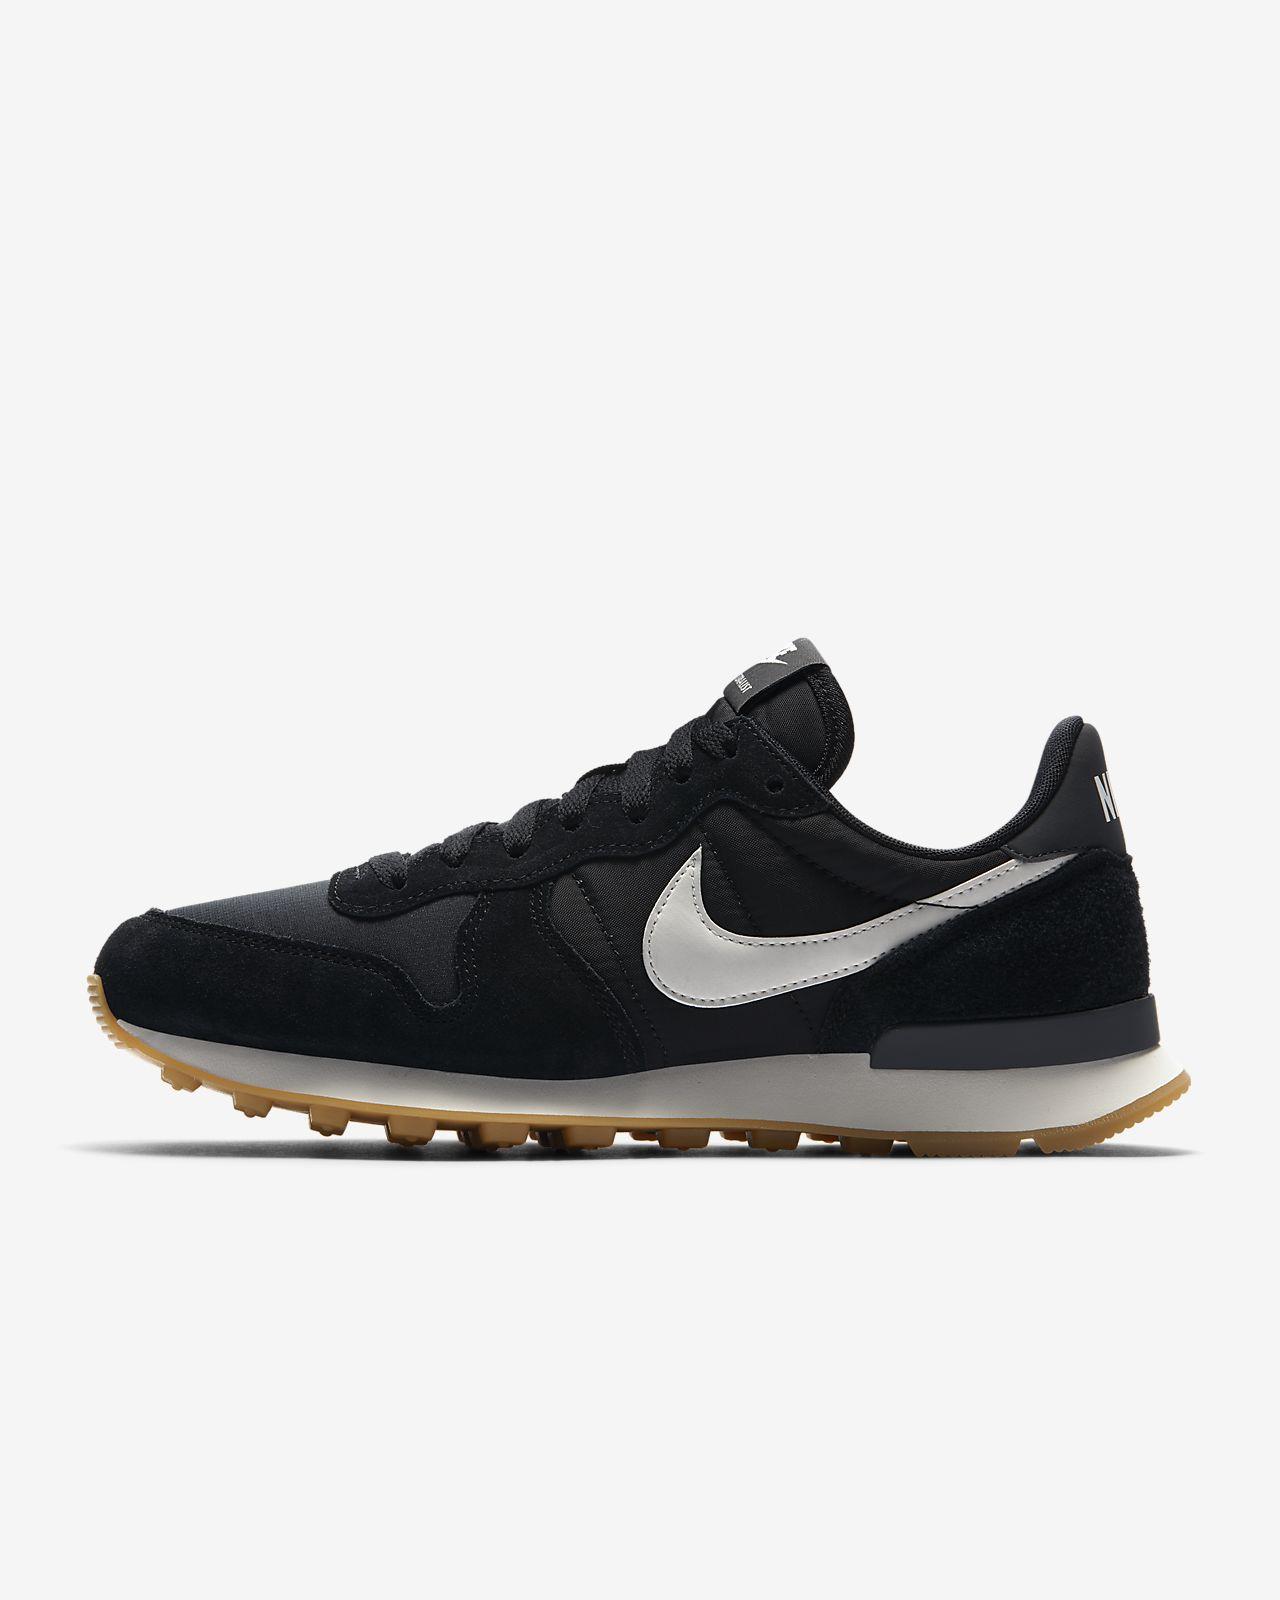 Nike Internationalist til Herre Klassisk Nike Design